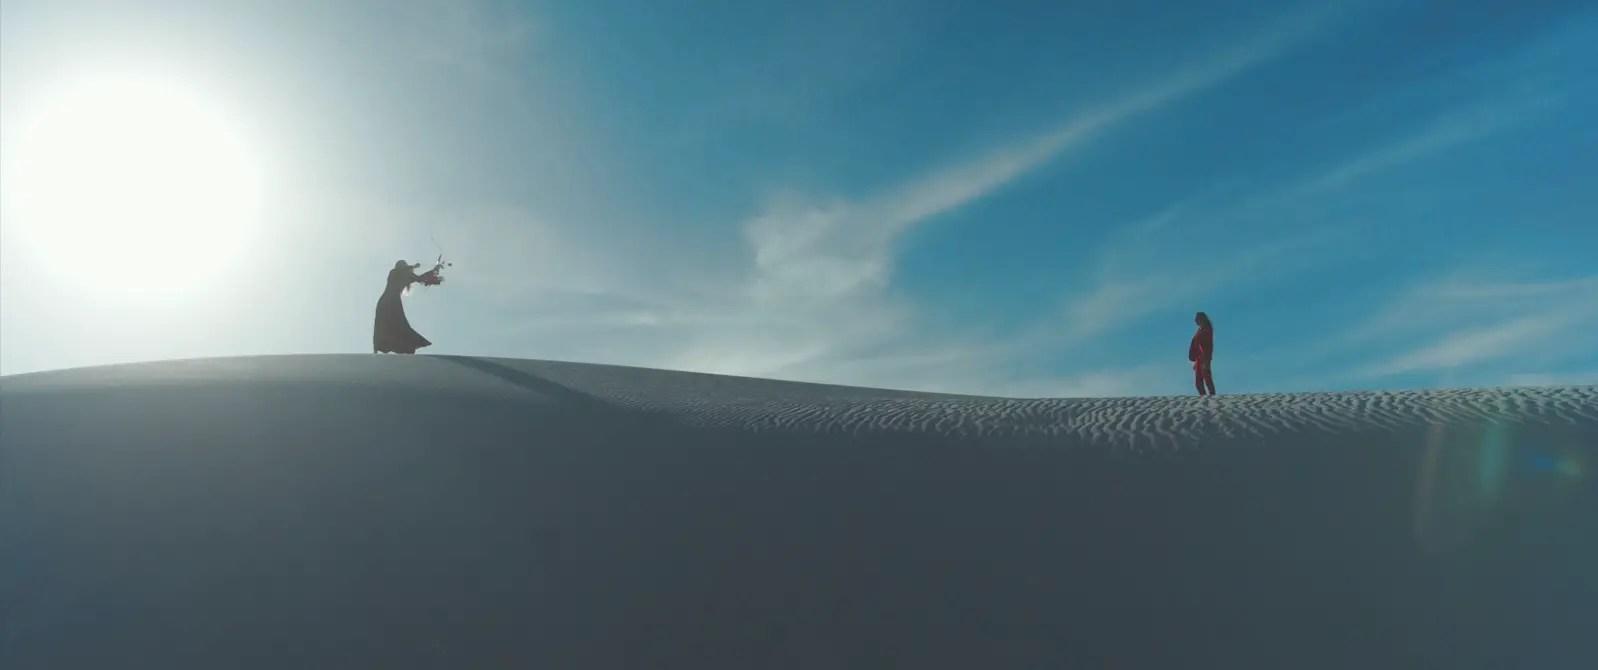 Desert Queen - Ecstatic Union © Natasha Wilson